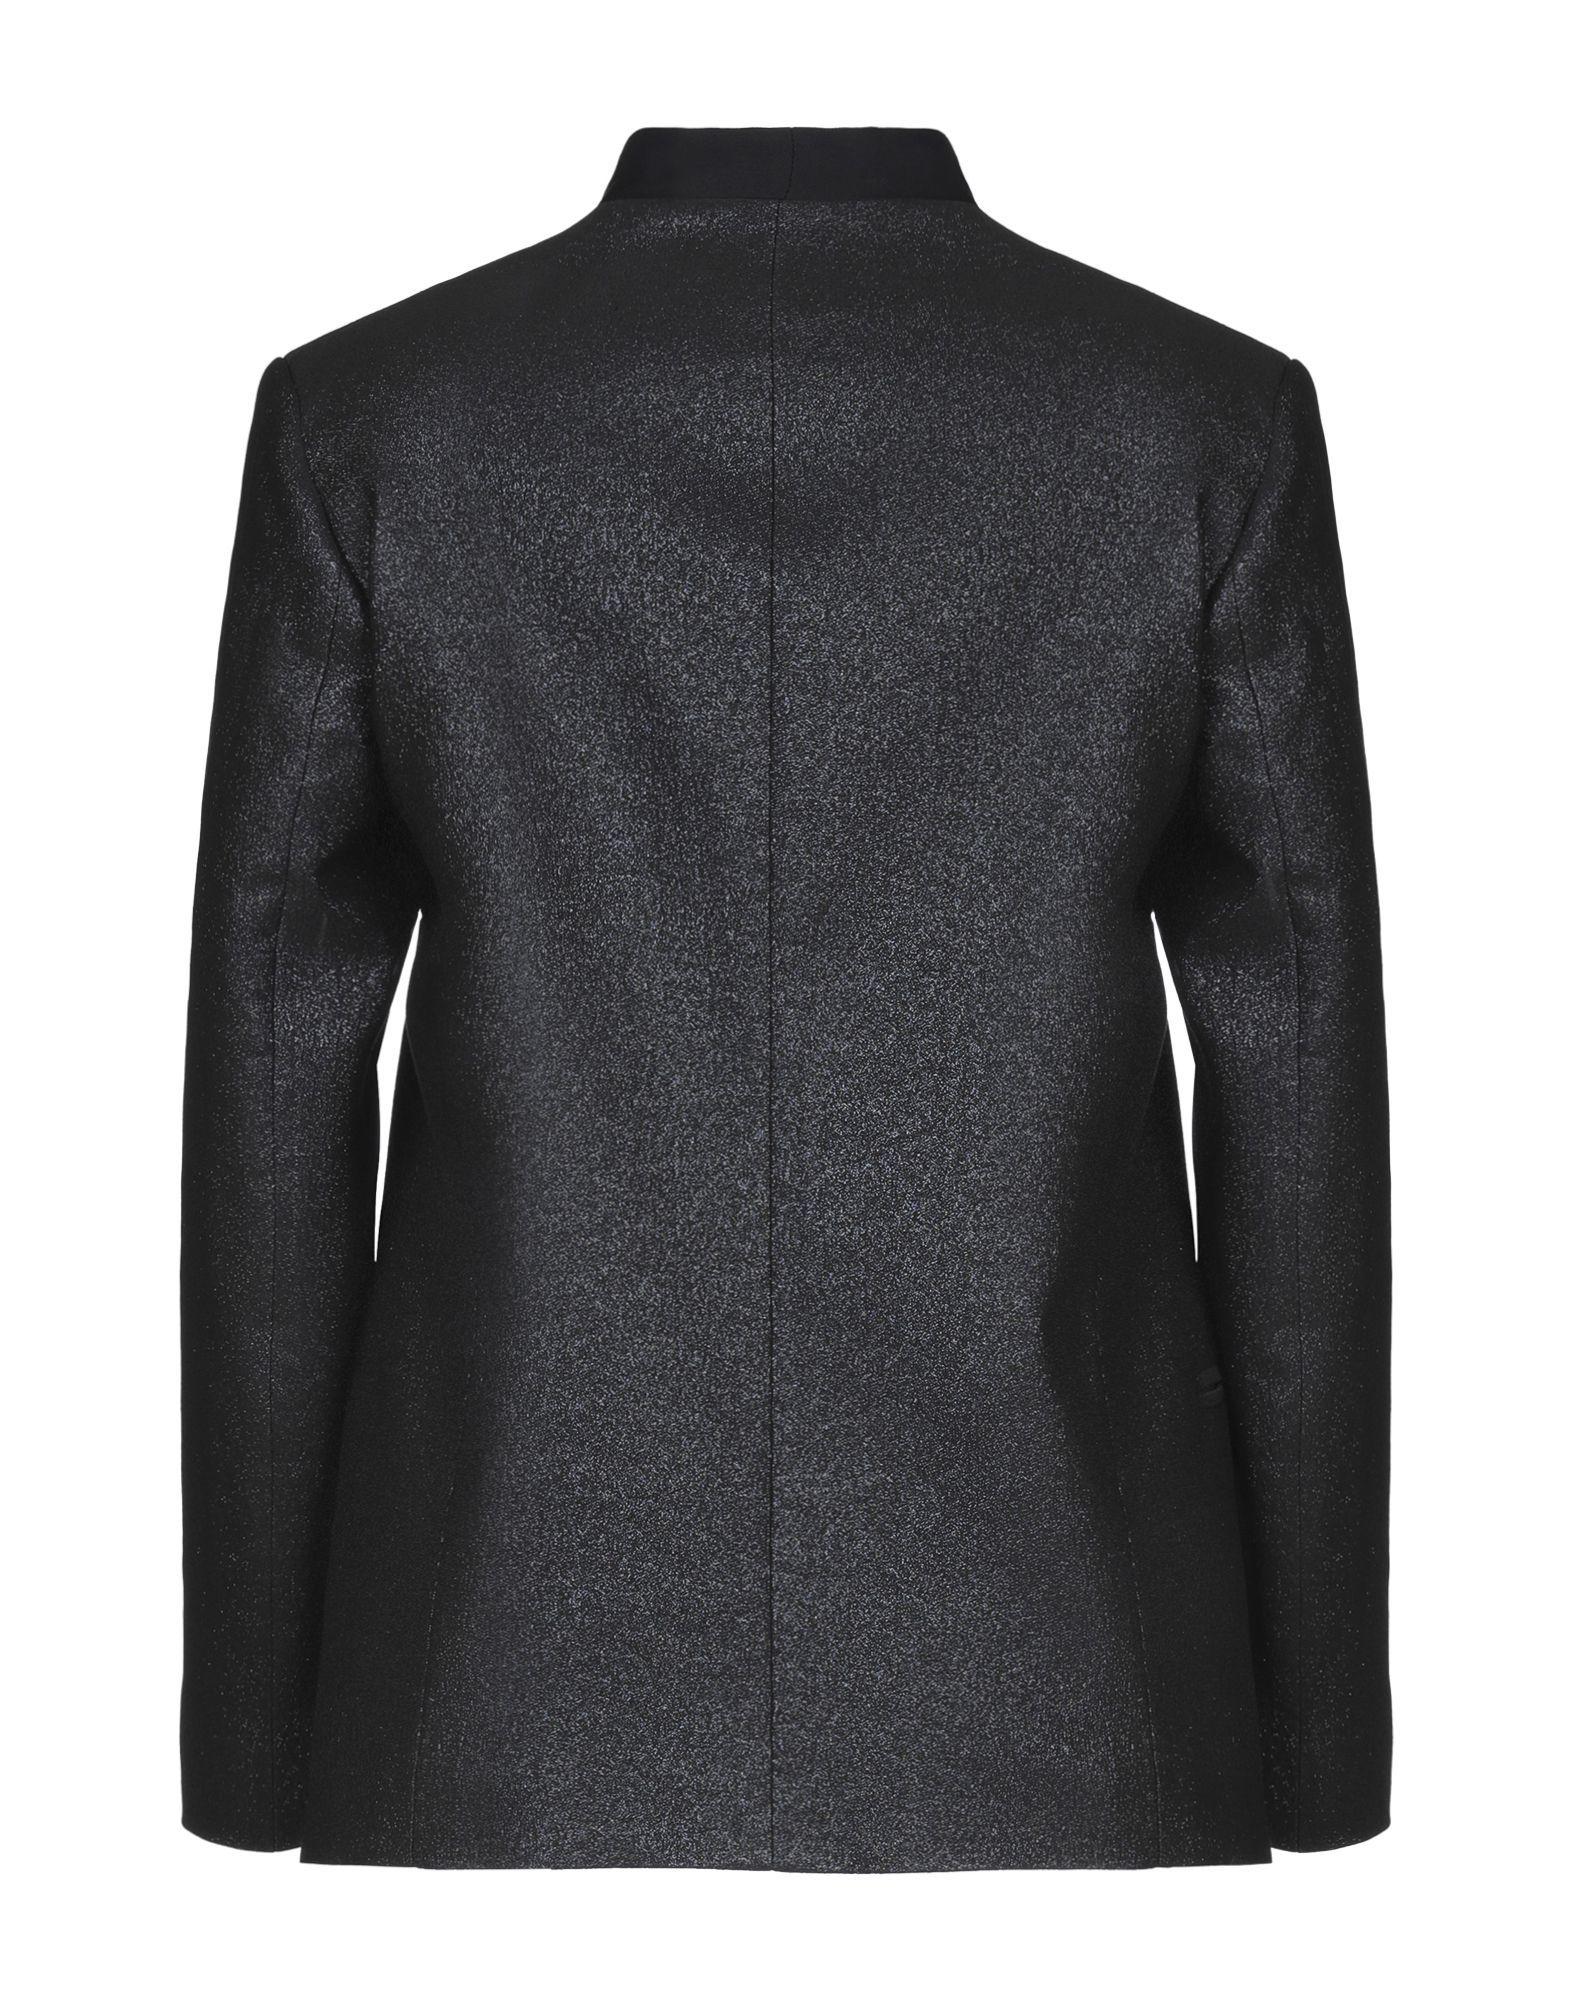 Mauro Grifoni Black Cotton Lame Single Breasted Blazer